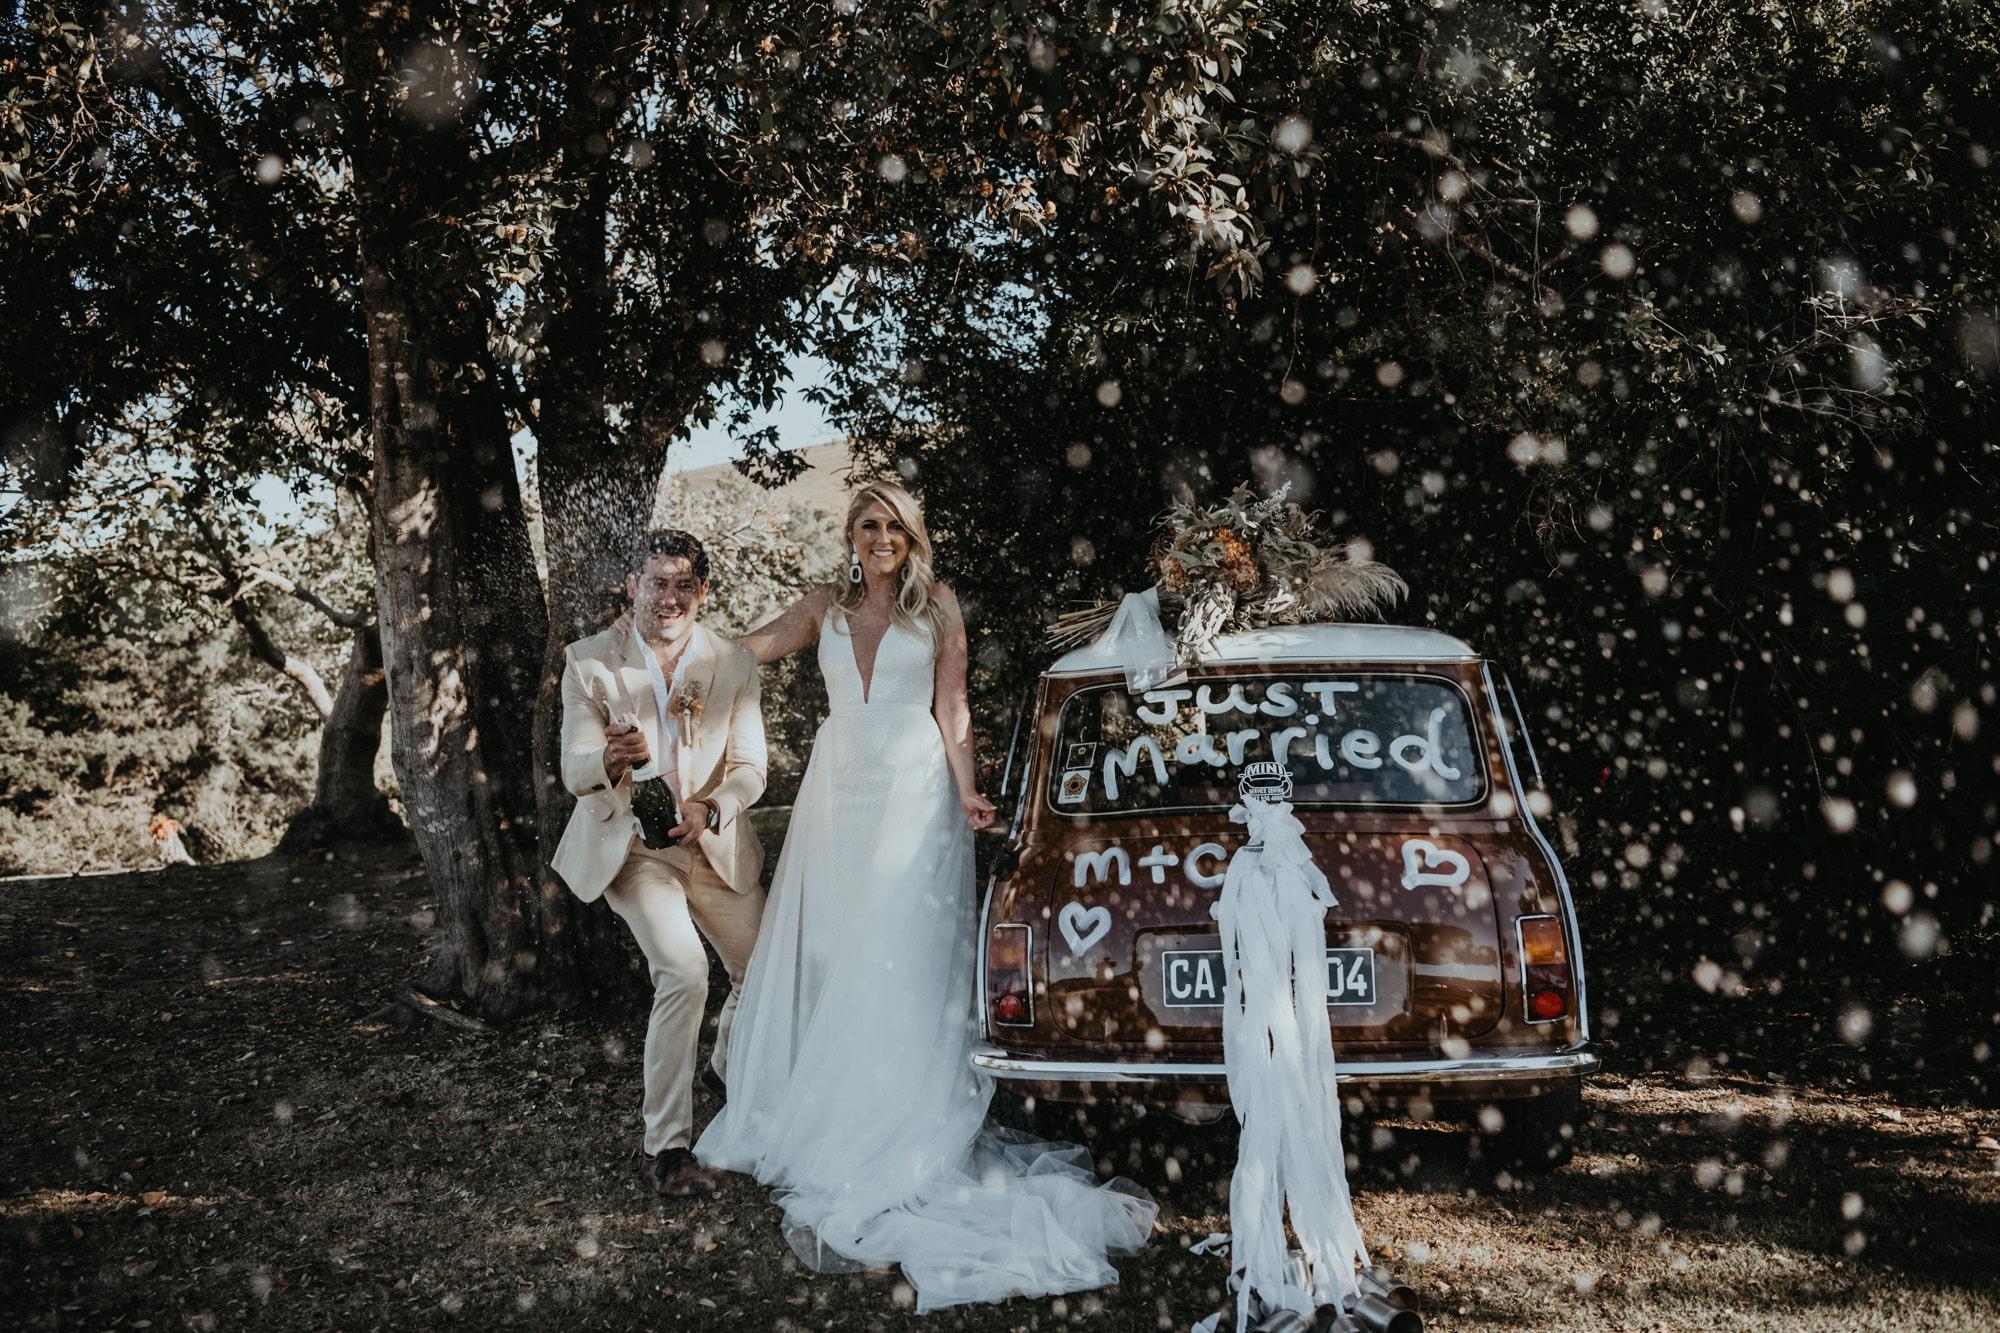 emily-moon-wedding-photography-sharyn-hodges-2